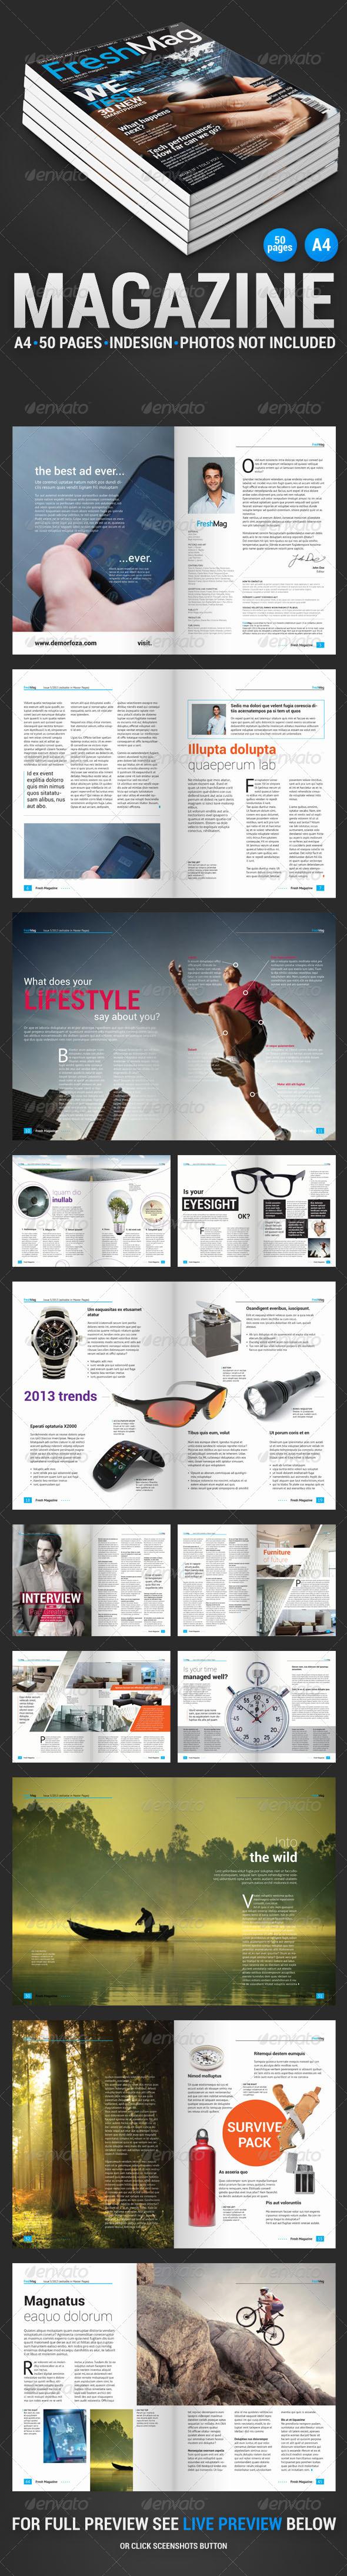 FreshMag 50 Page Magazine - Magazines Print Templates